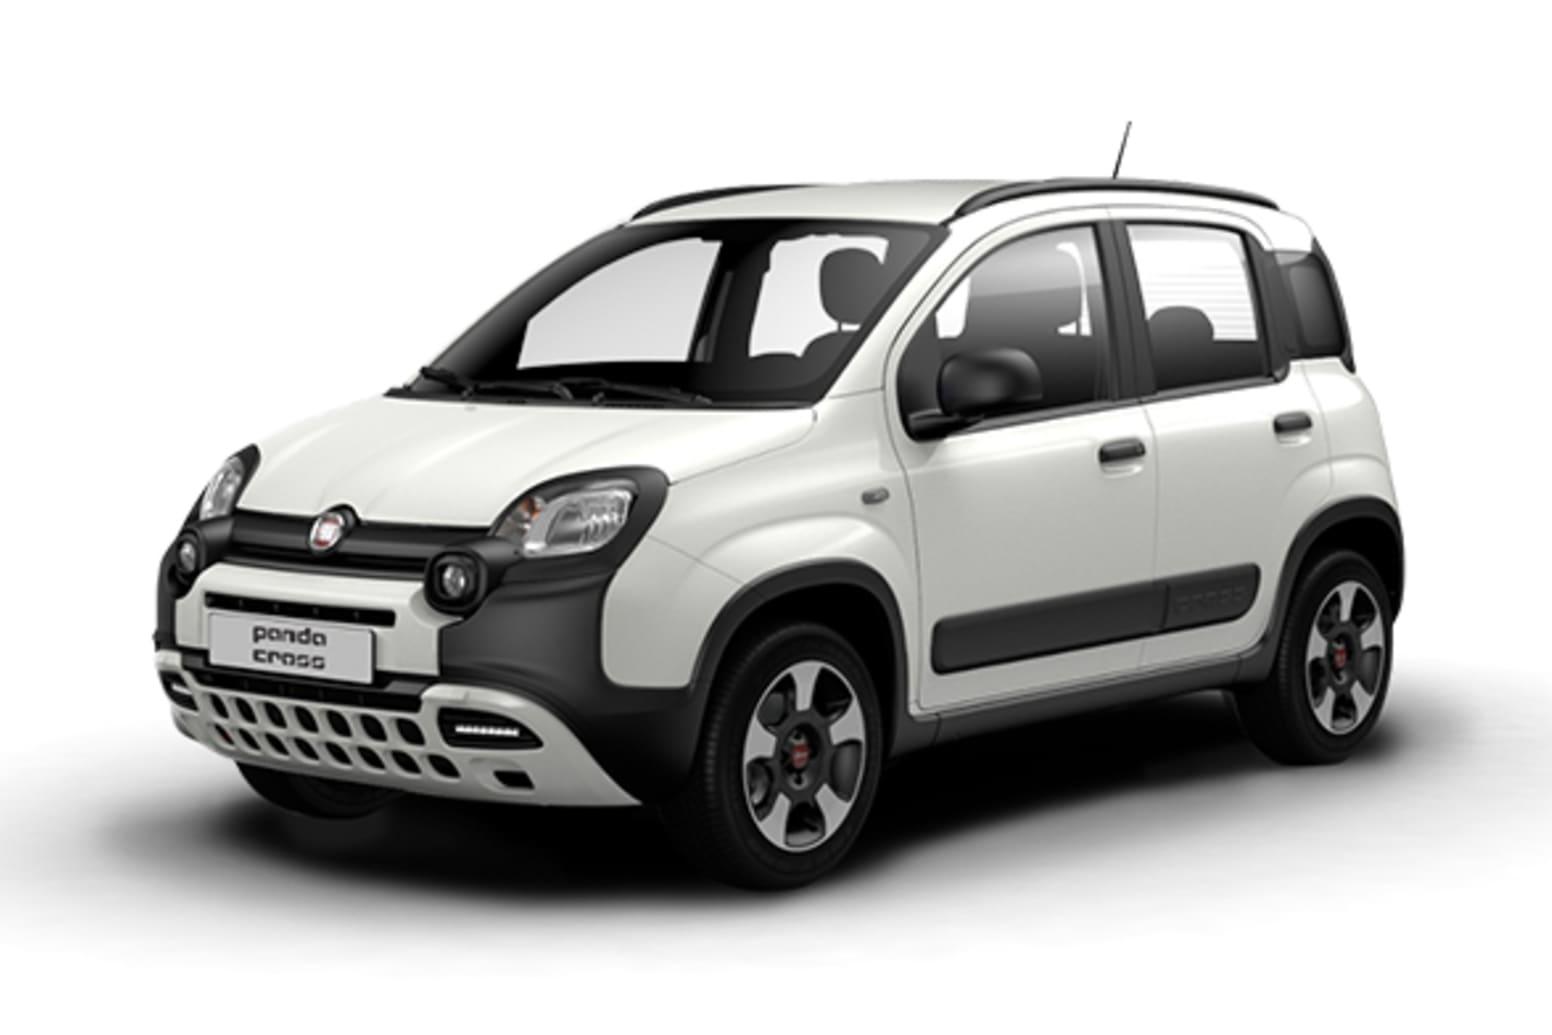 Fiat Panda 1.0 City Cross Hybrid